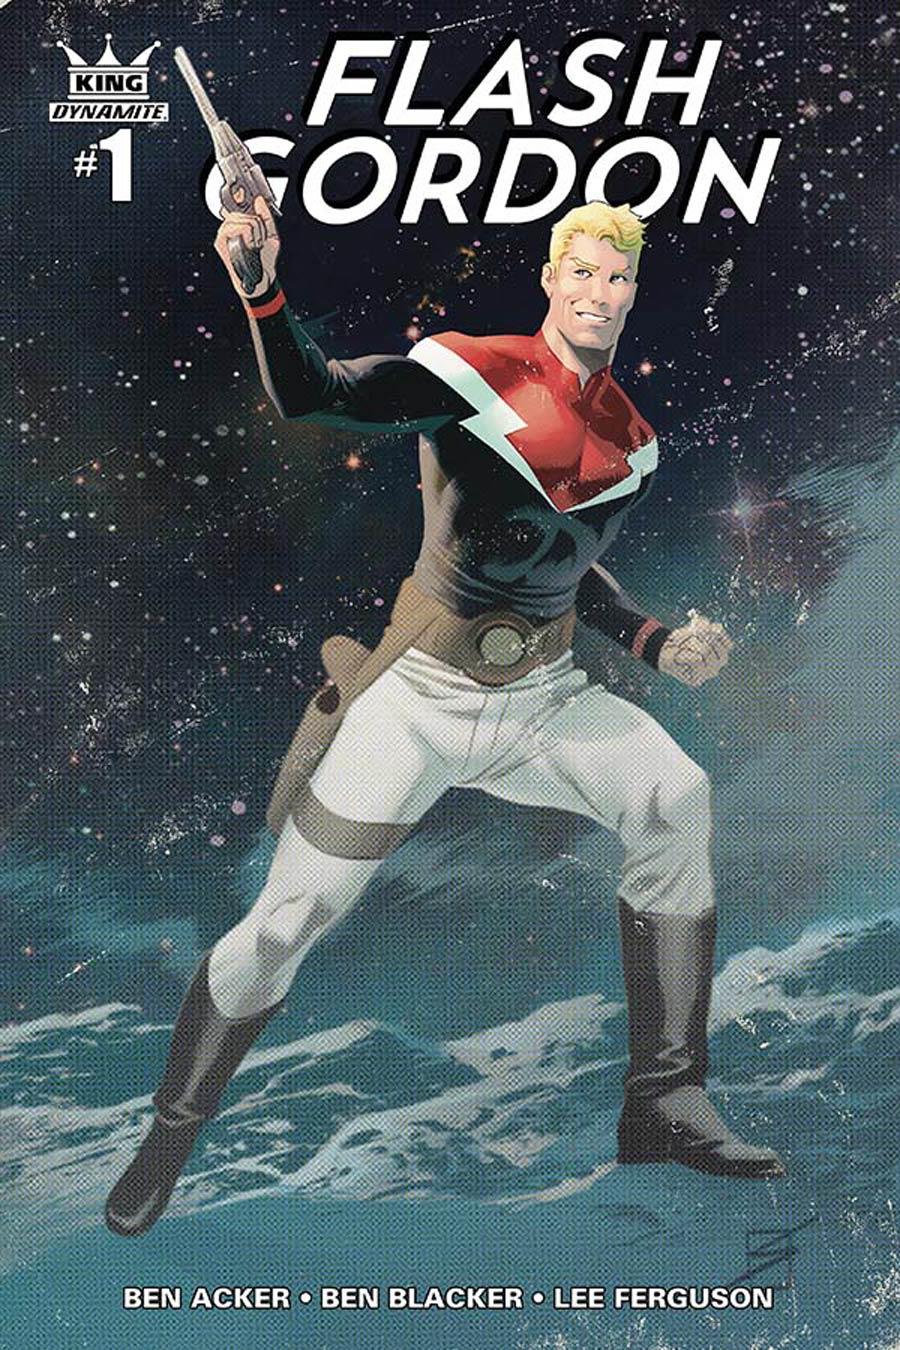 King Flash Gordon #1 Cover D Incentive Ron Salas Color Variant Cover